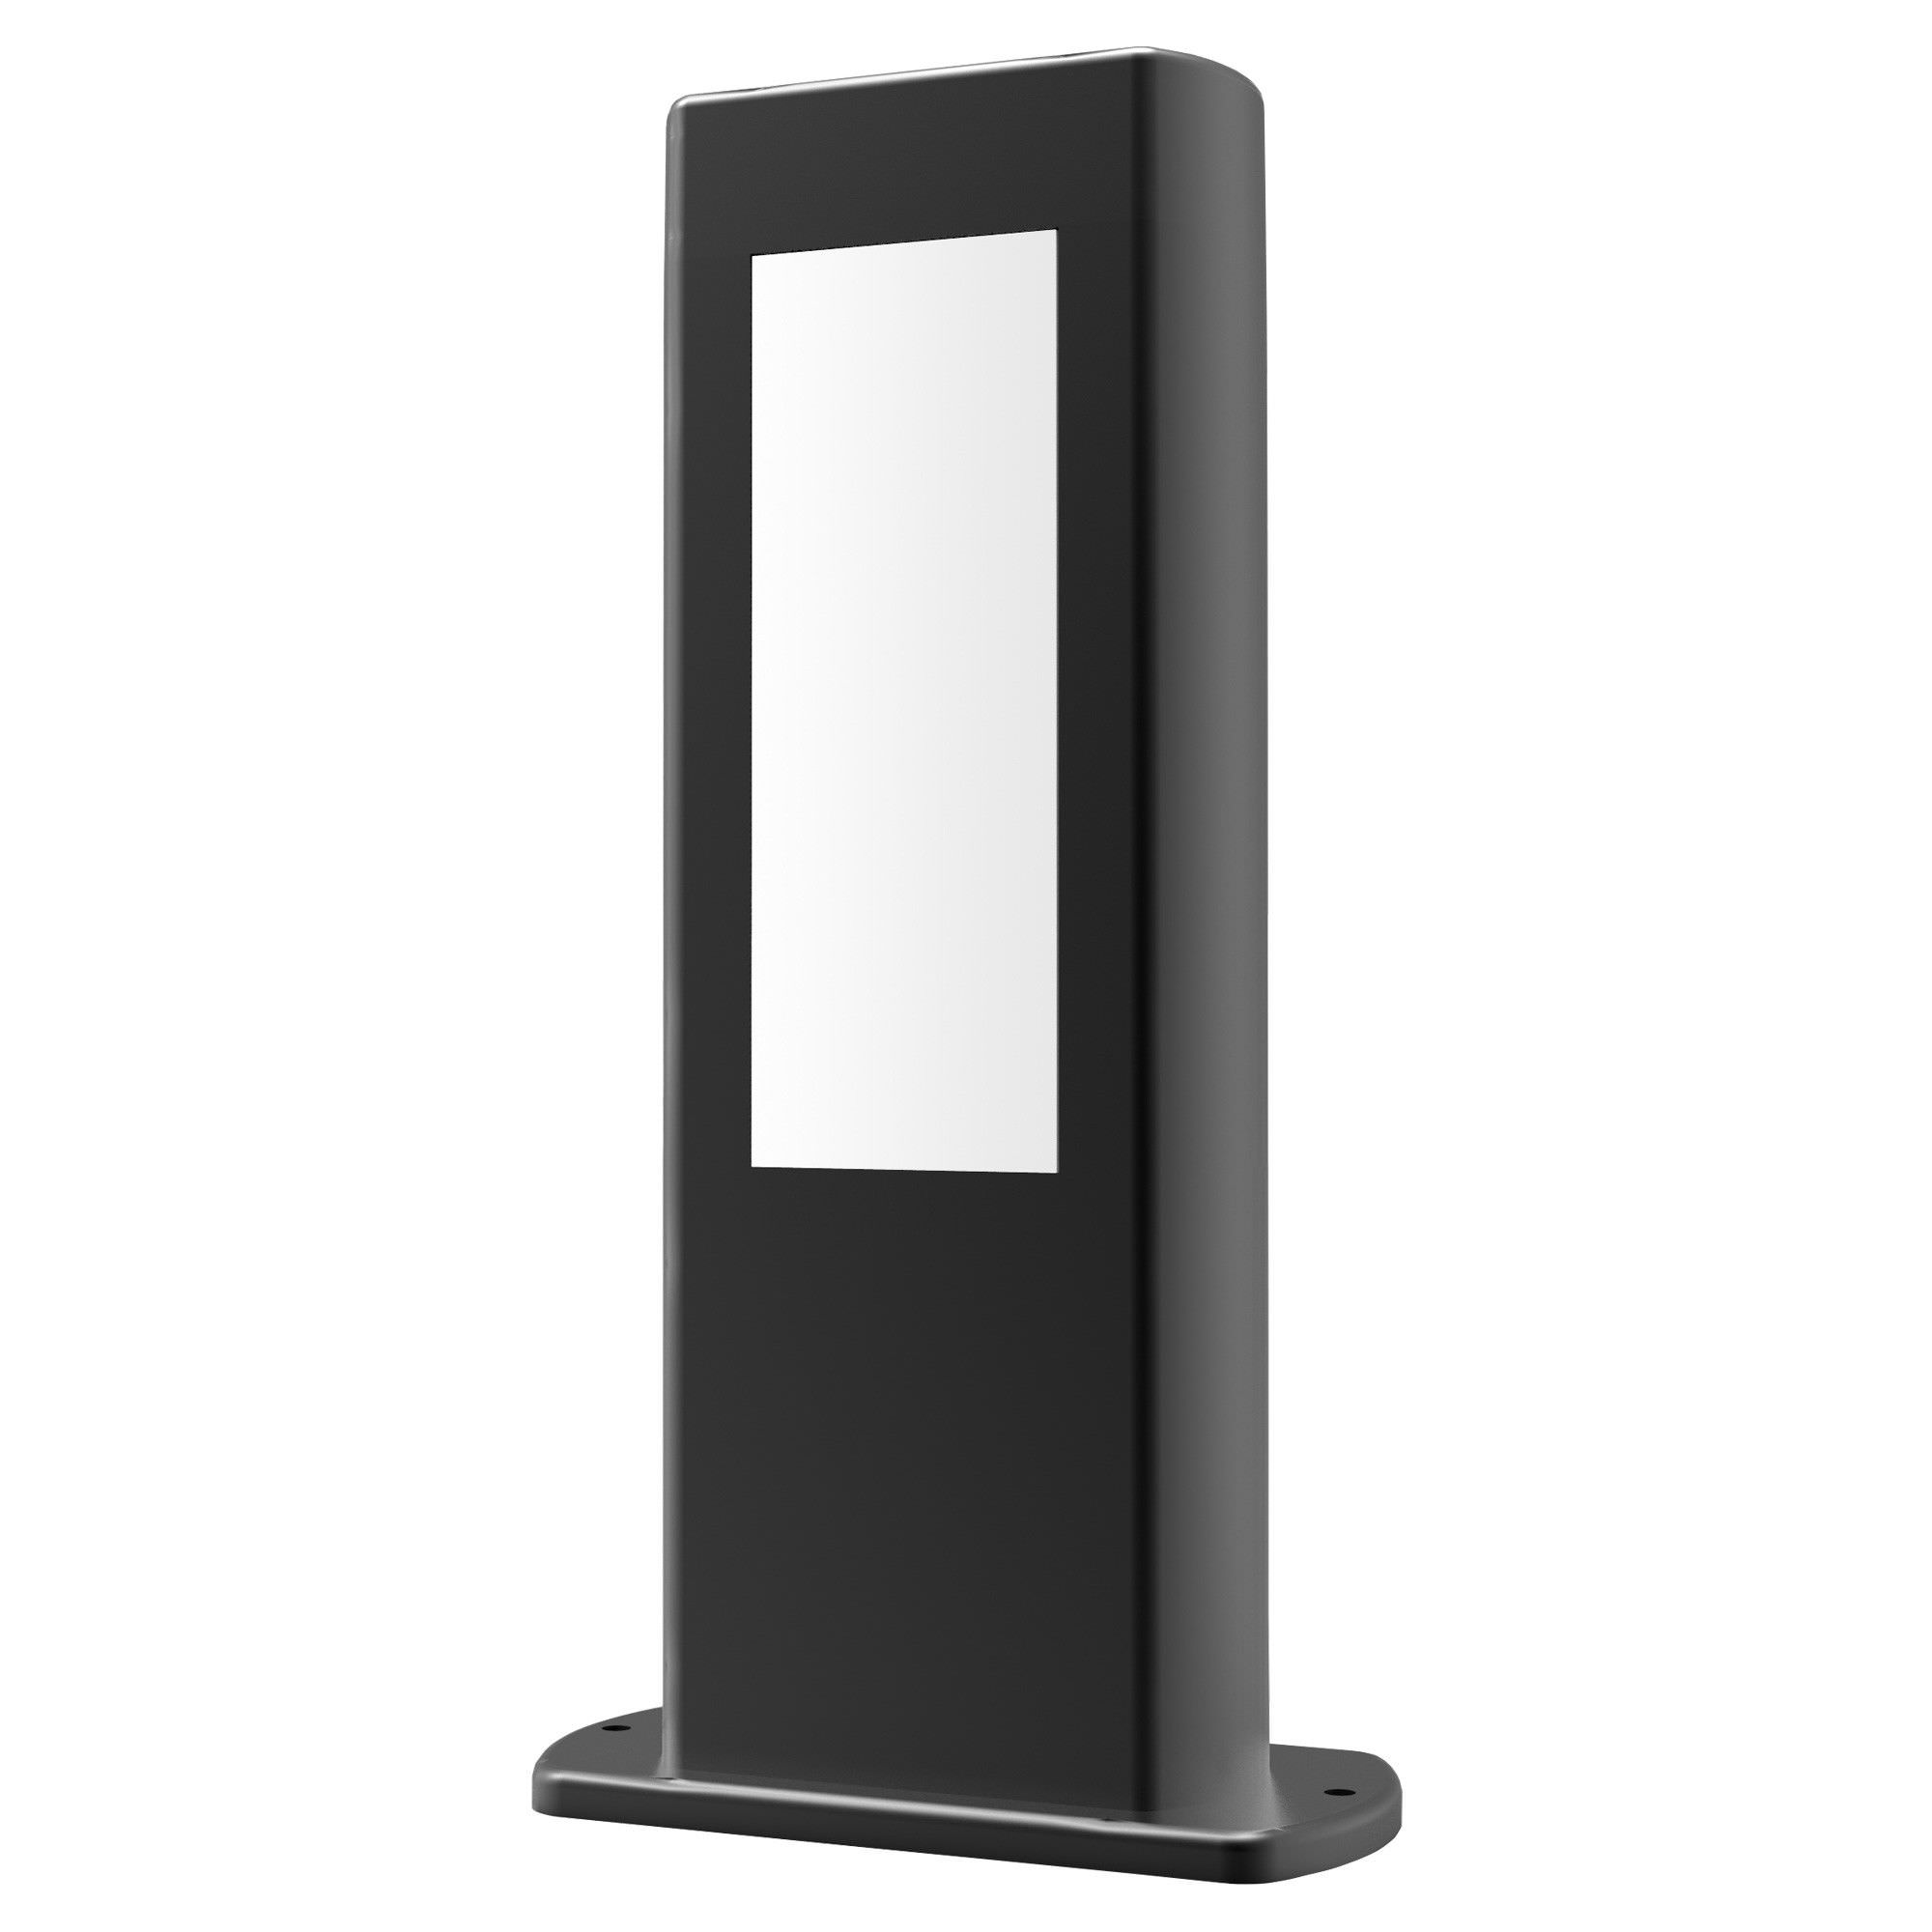 Amun IP54 Exterior LED Bollard Light, 30cm, Black